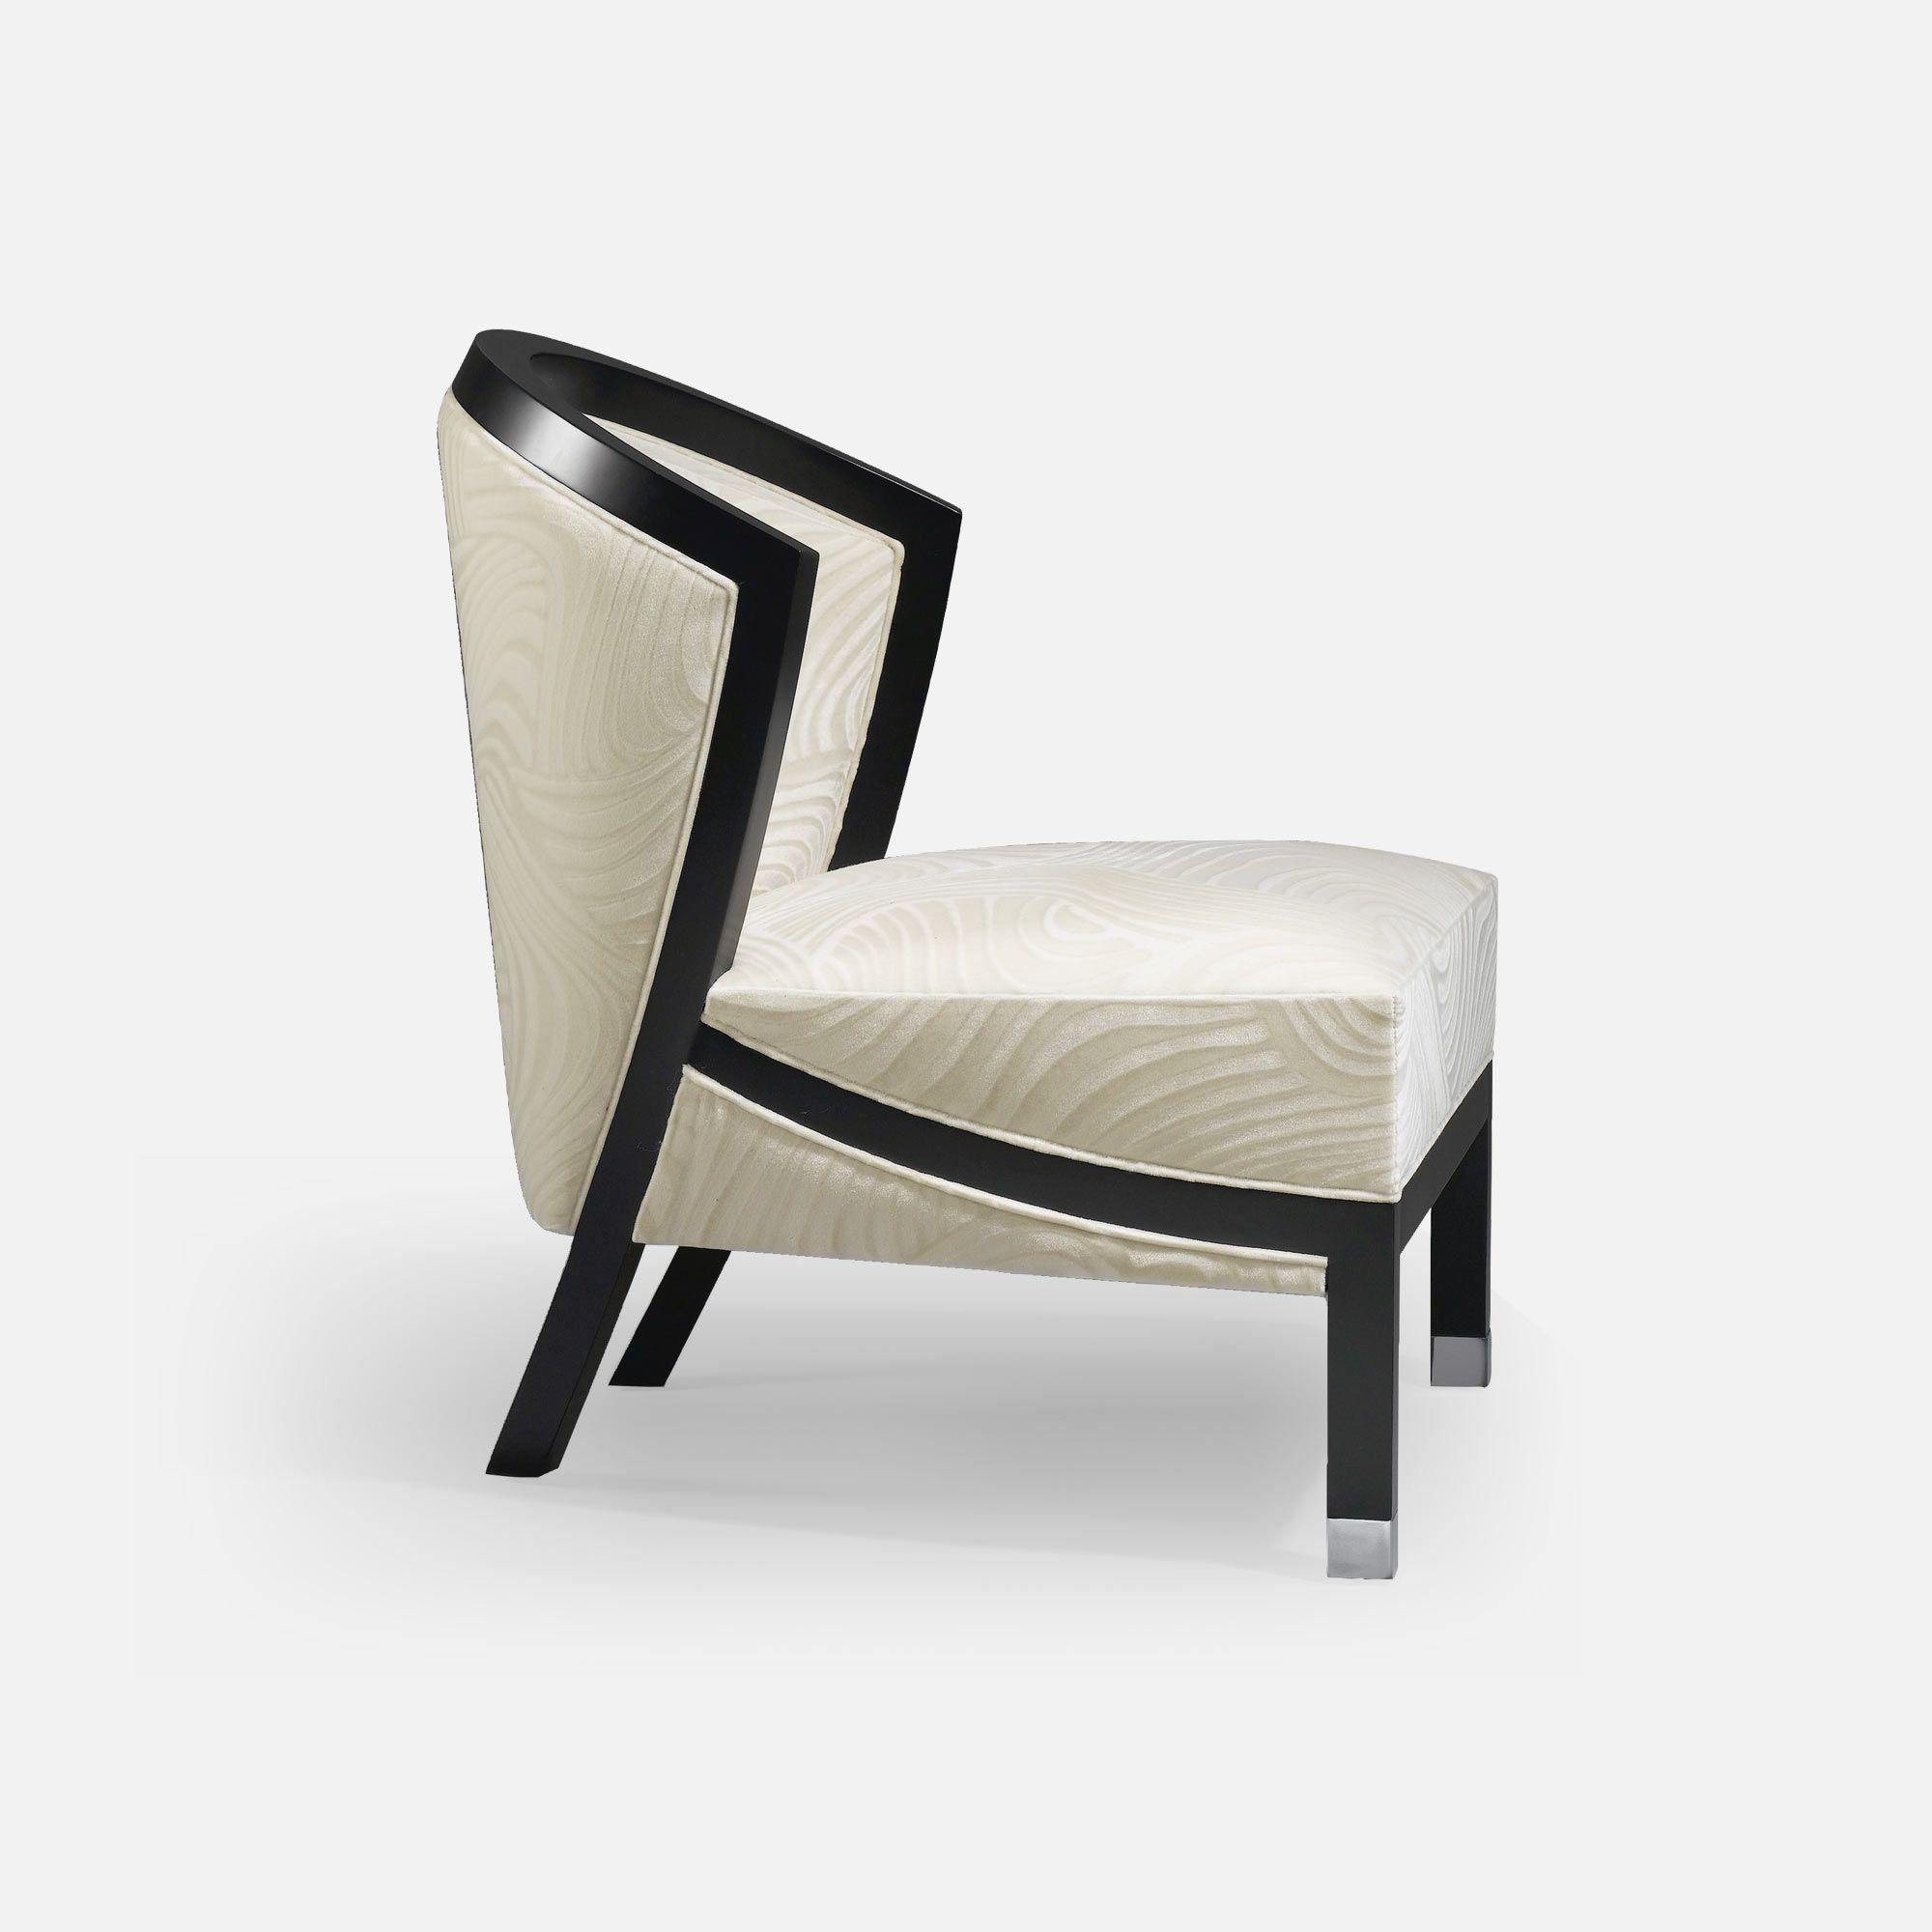 chauffeuse haut de gamme claude robin collinet. Black Bedroom Furniture Sets. Home Design Ideas